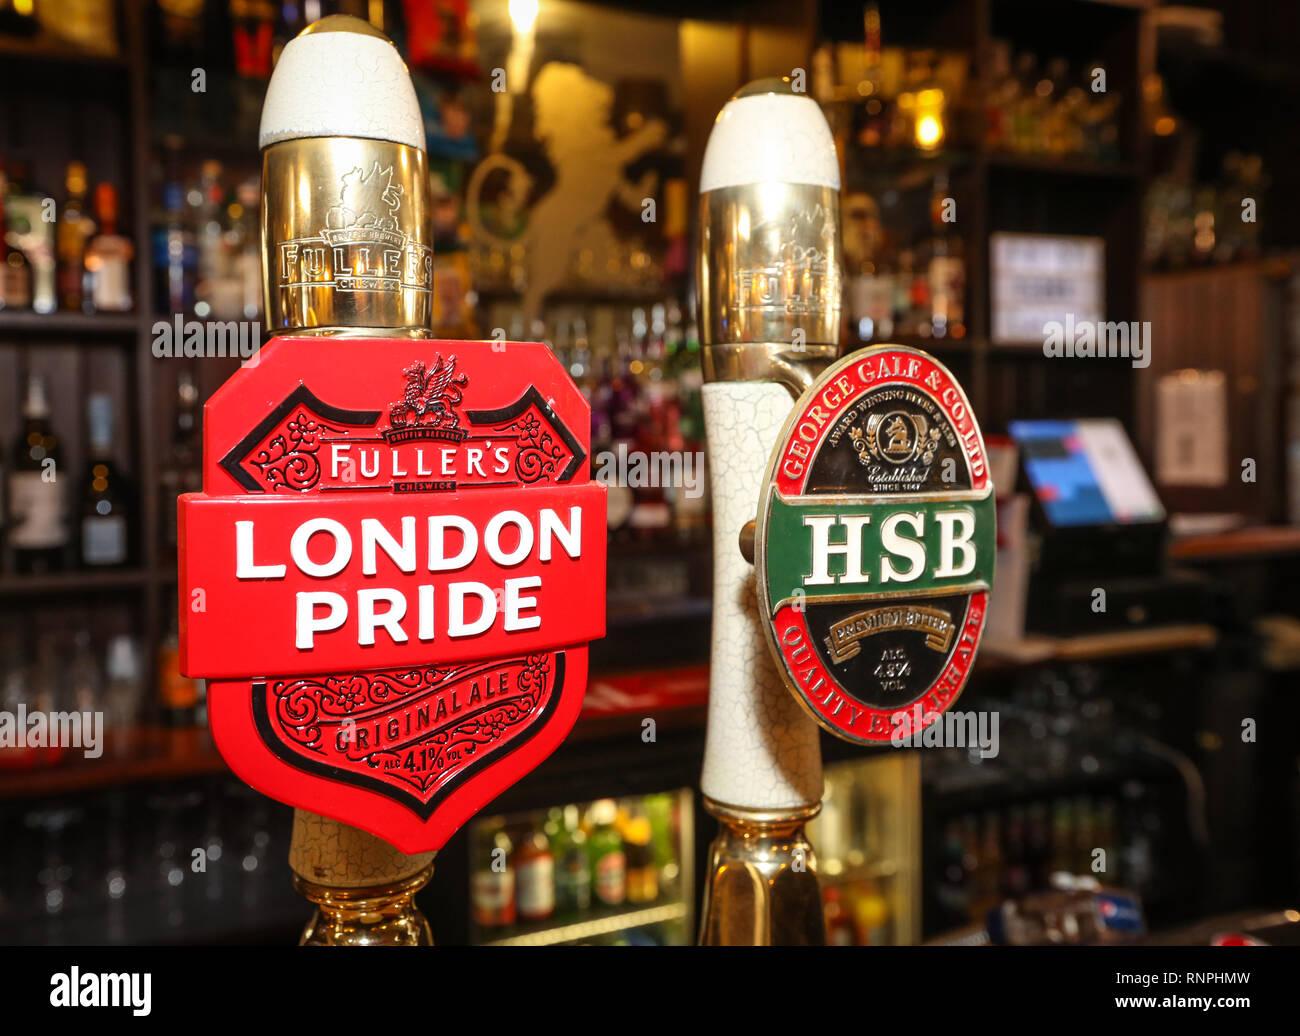 Fuller's London Pride beer pump in a UK pub - Stock Image